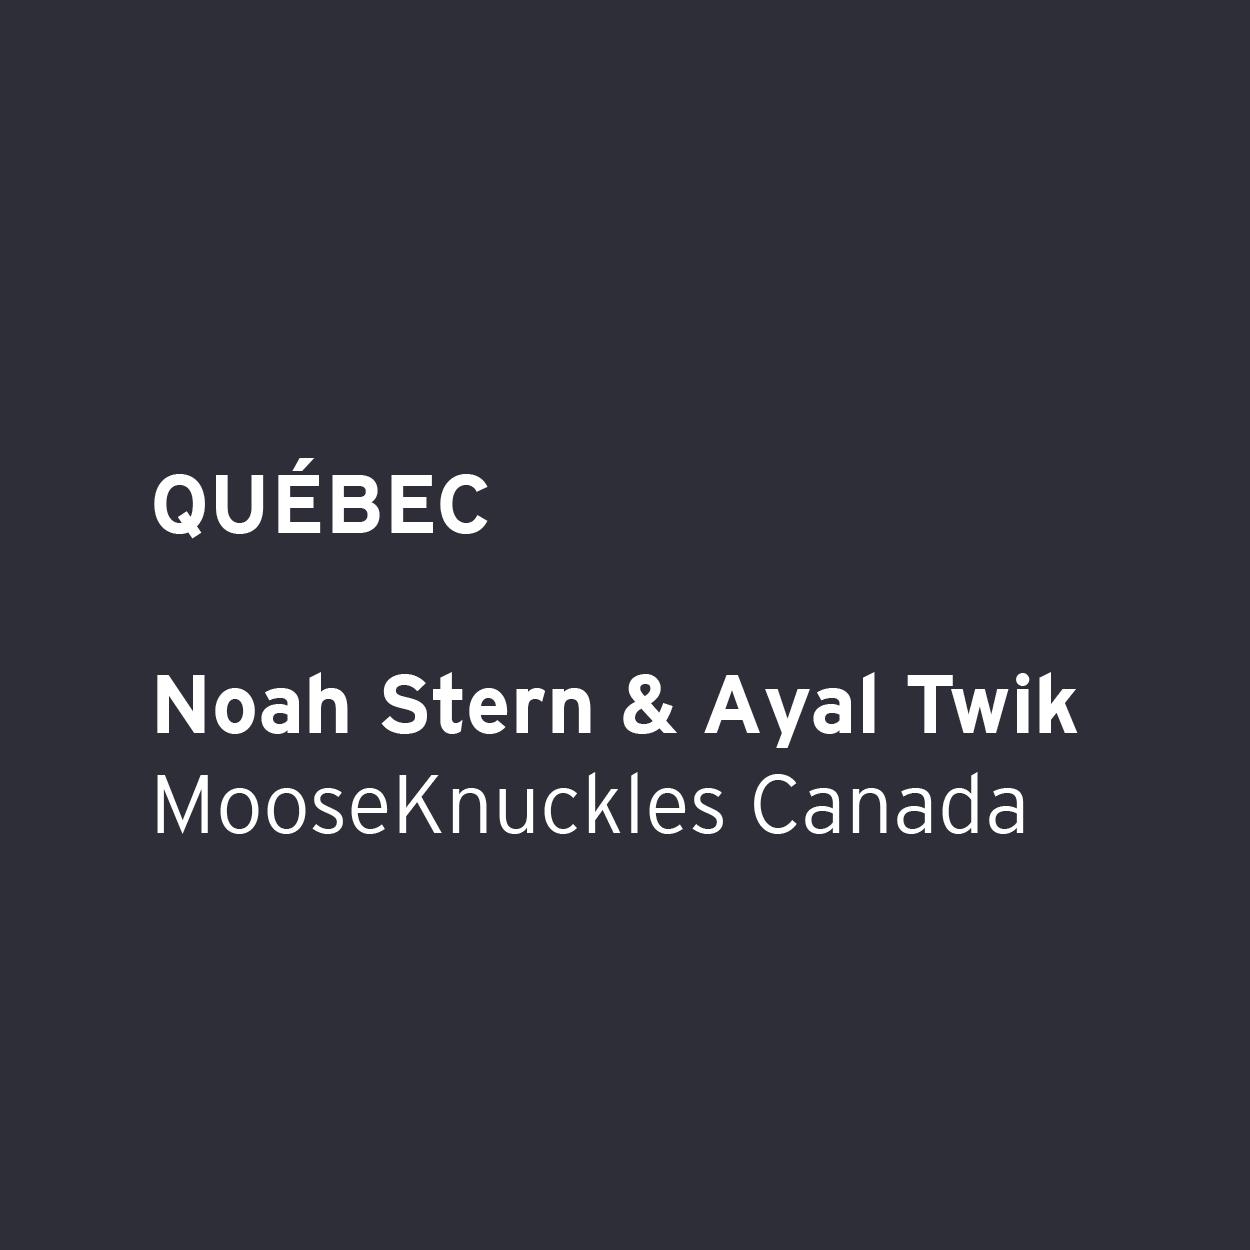 Noah Stern & Ayal Twik - MooseKnuckles Canada